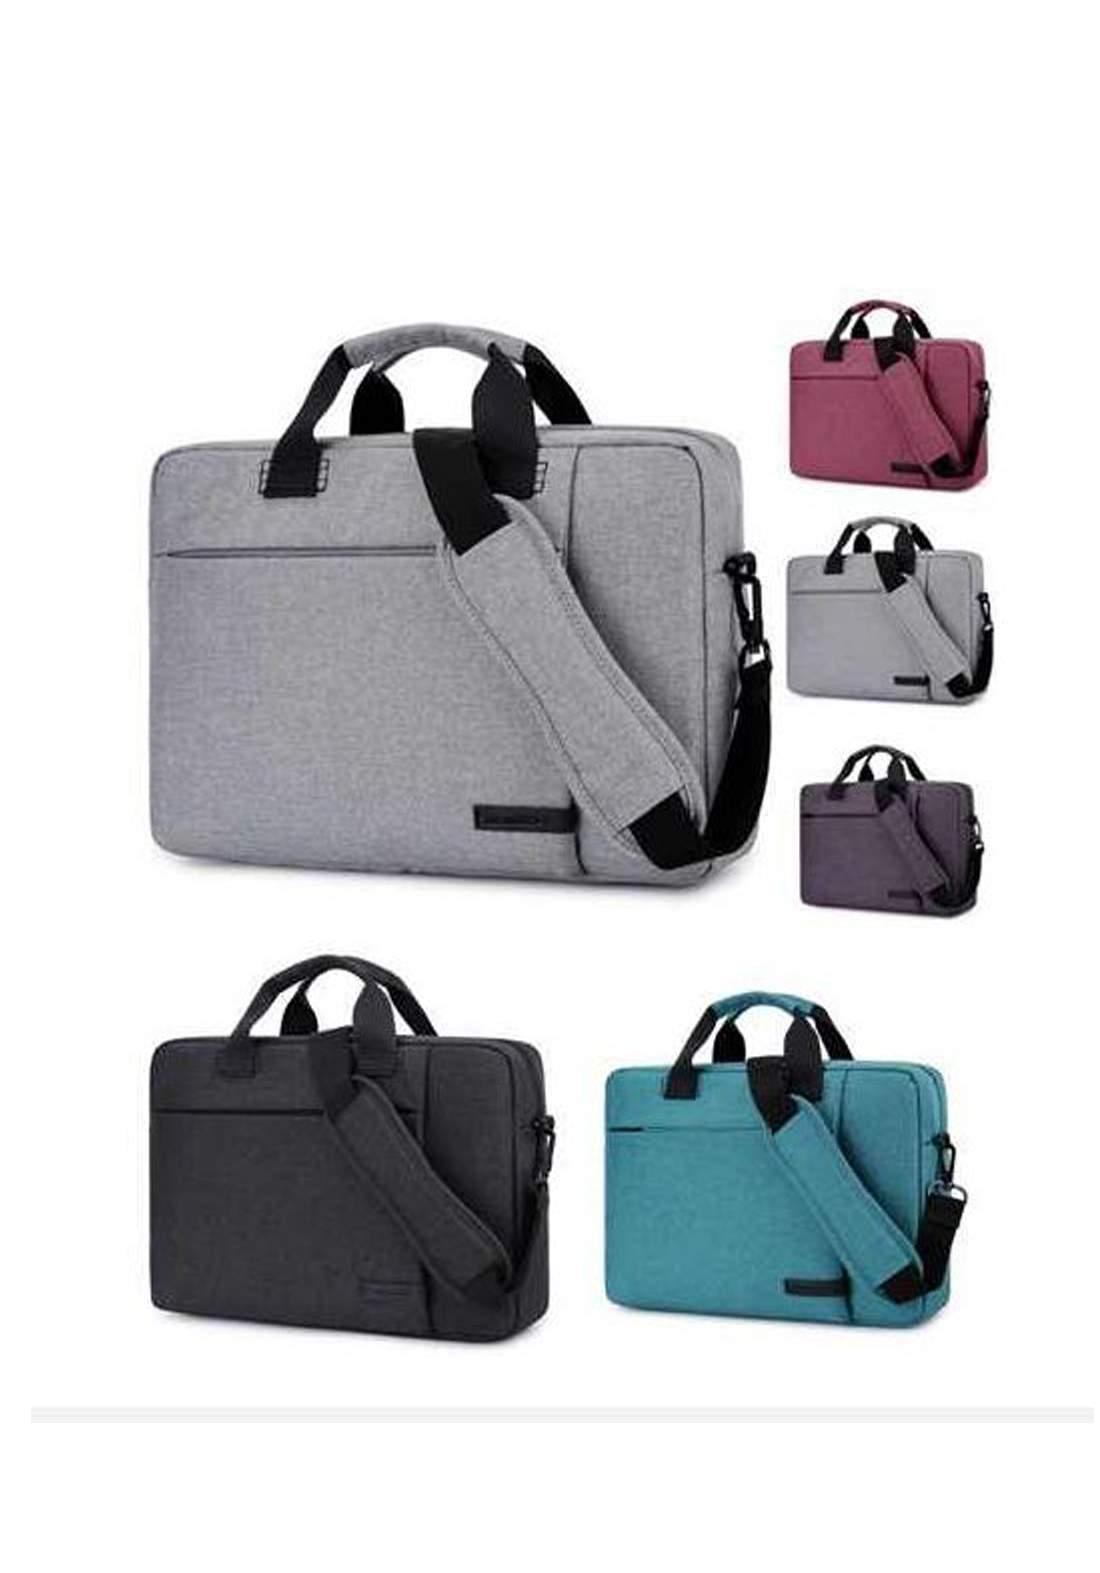 Brinch BW-223 Waterproof Laptop Bag حقيبة لابتوب